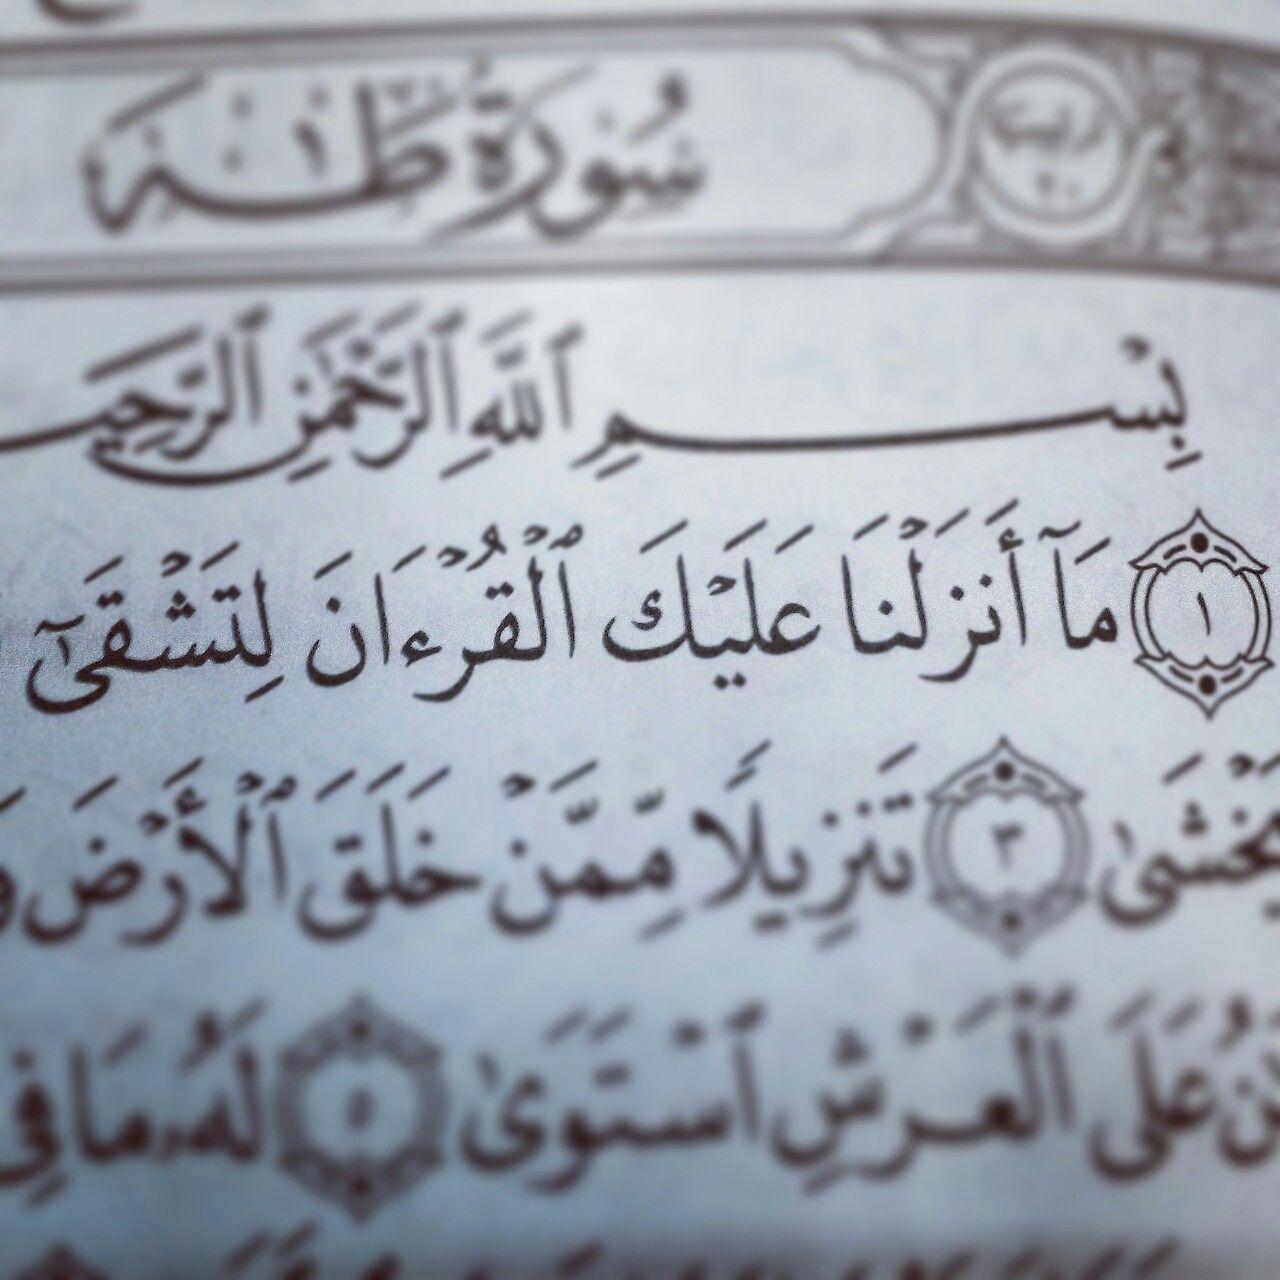 م آ أ نز ل ن ا ع ل ي ك ٱل ق ر ء ان ل ت ش ق ى ٢ طه Quran Arabic Calligraphy My Love